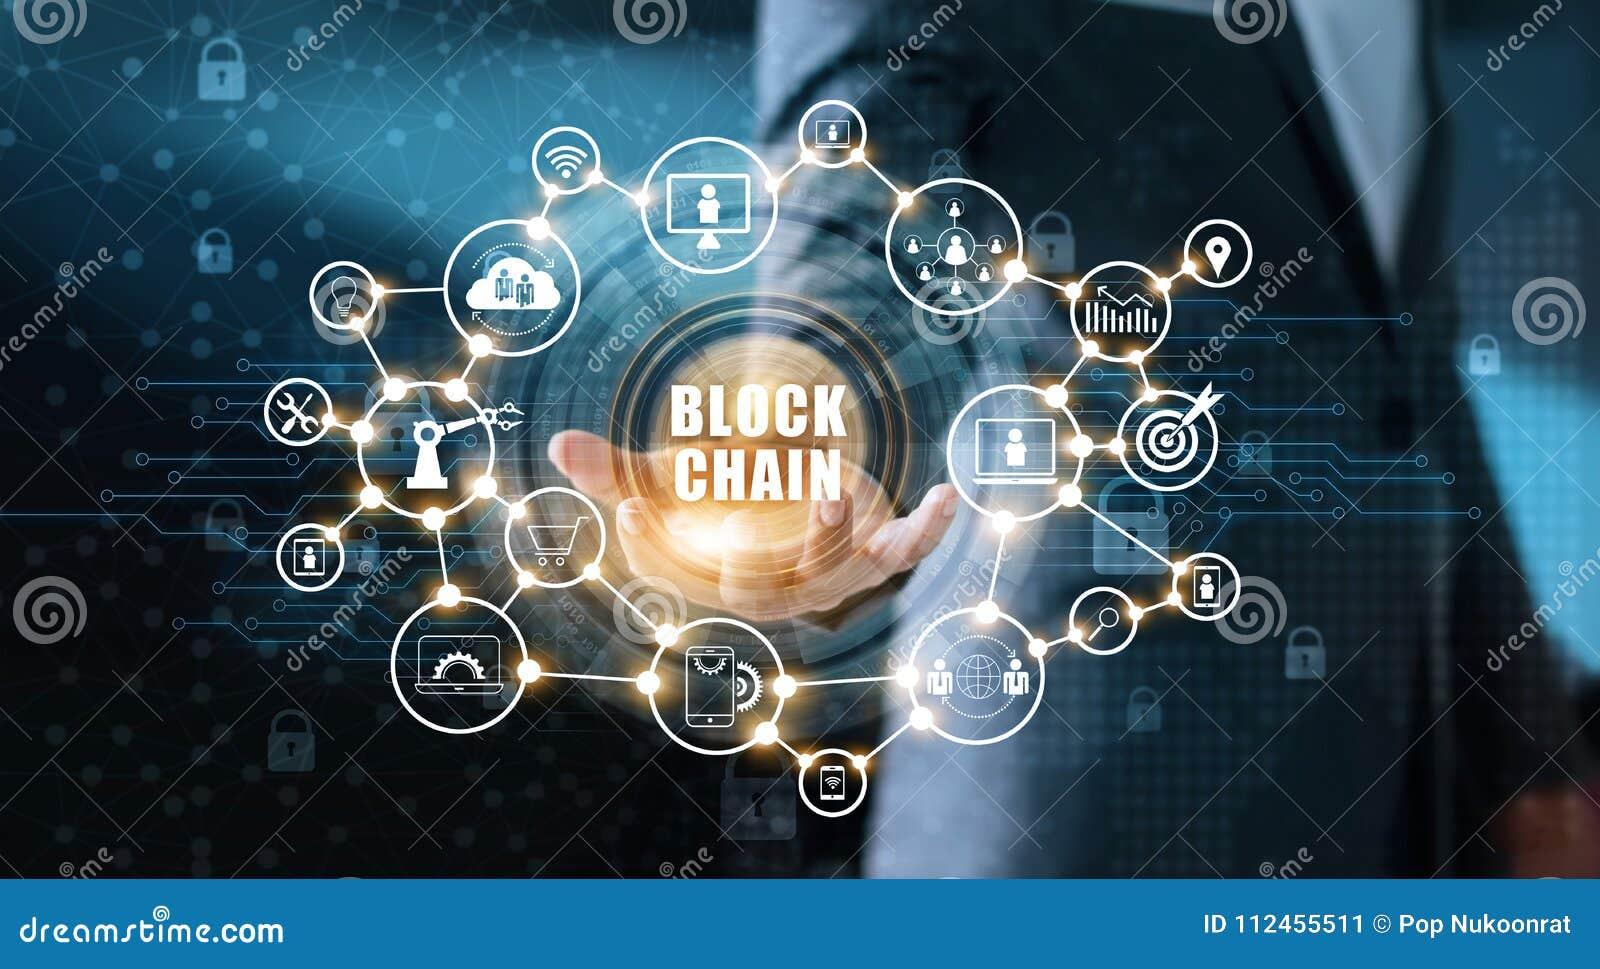 Technology Management Image: Blockchain Technology And Network Concept. Businessman